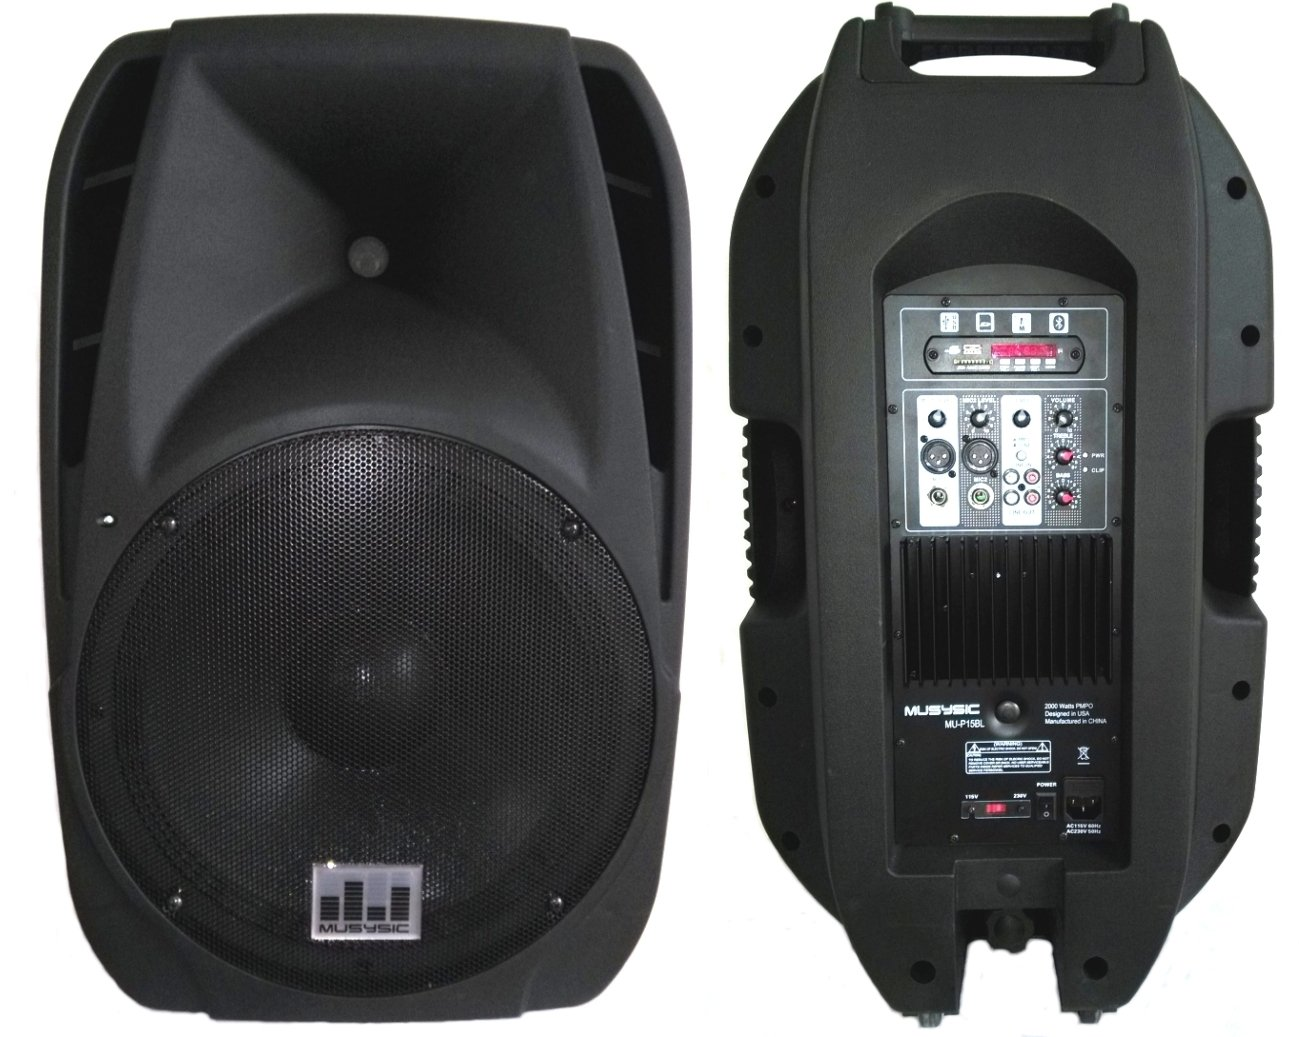 Blackmore PA System Black BJS-218BT